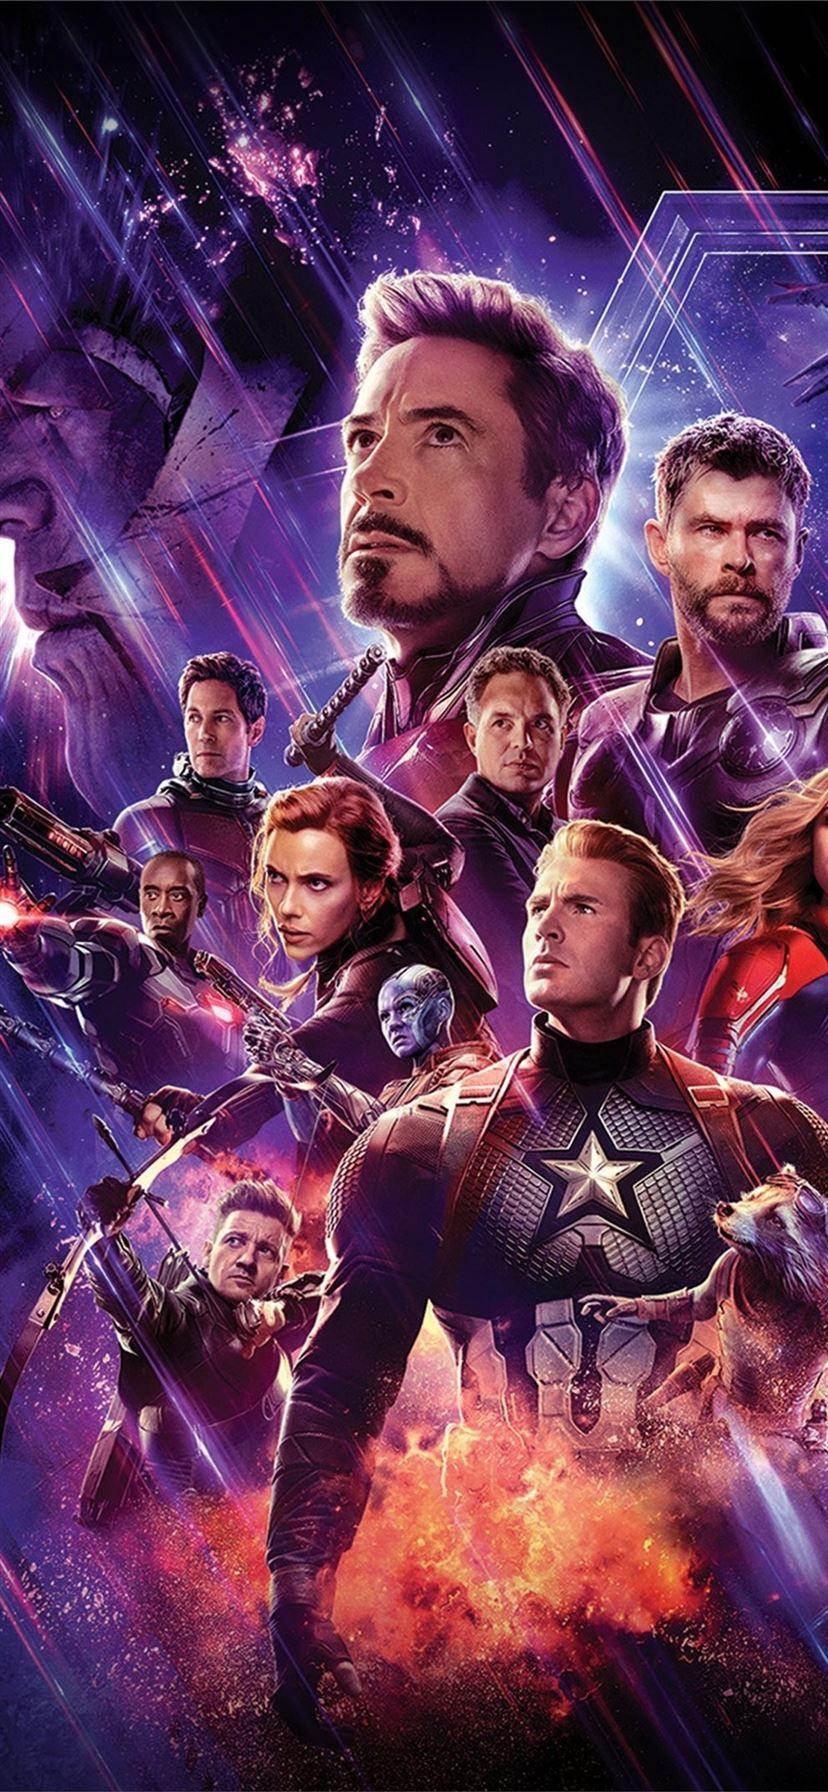 Disney Plus Avengers Endgame 4k Iphone 11 Wallpapers Free Download